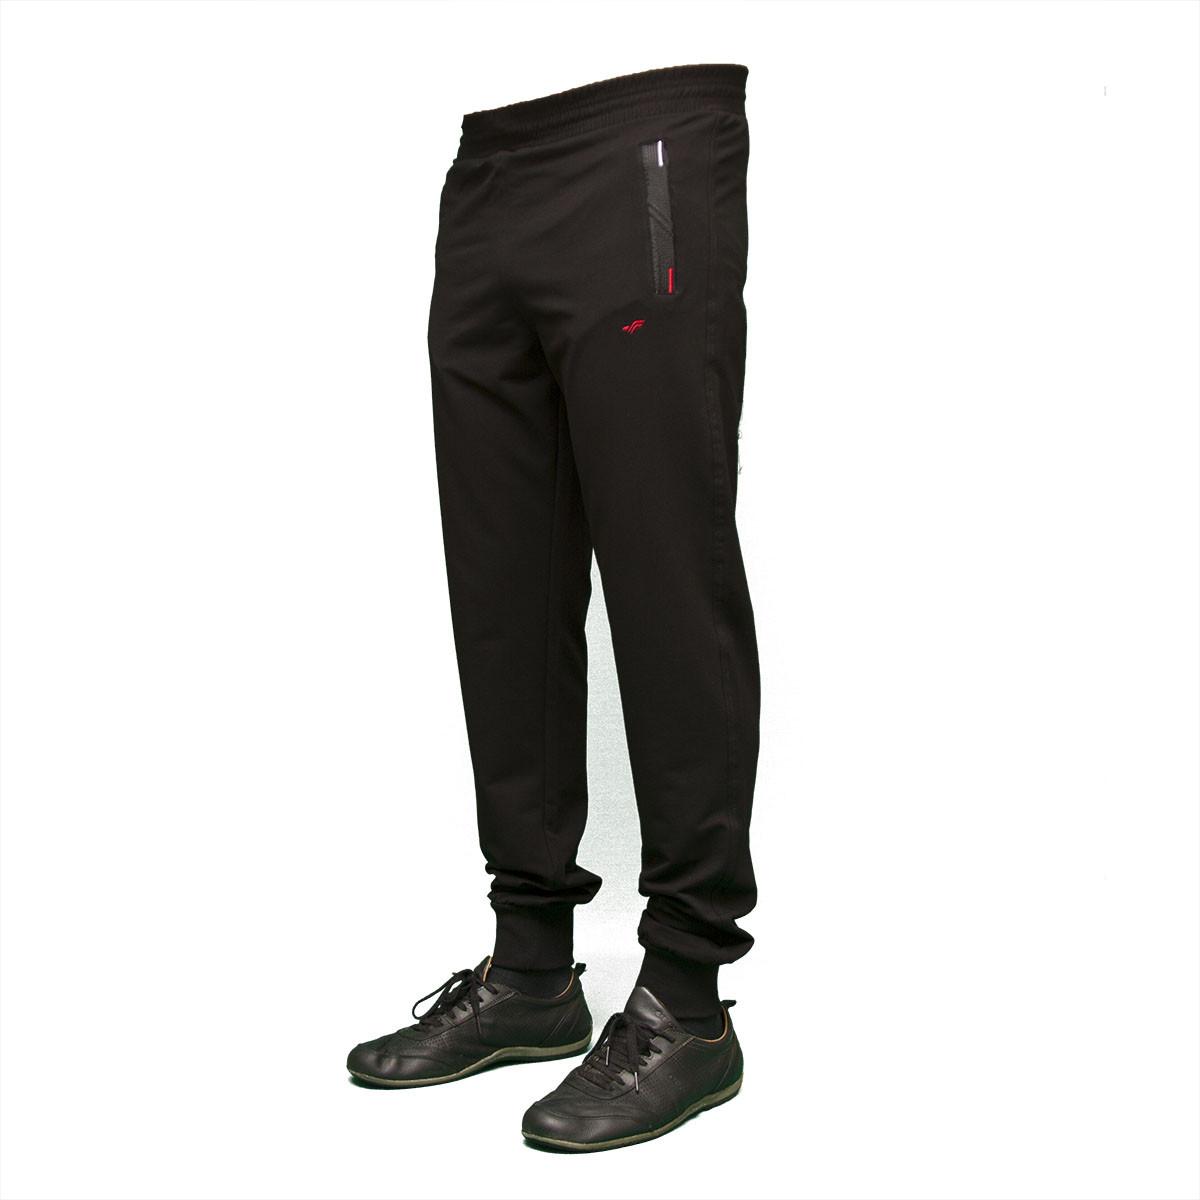 Спортивные штаны на манжете Турция  тм. FORE  9419